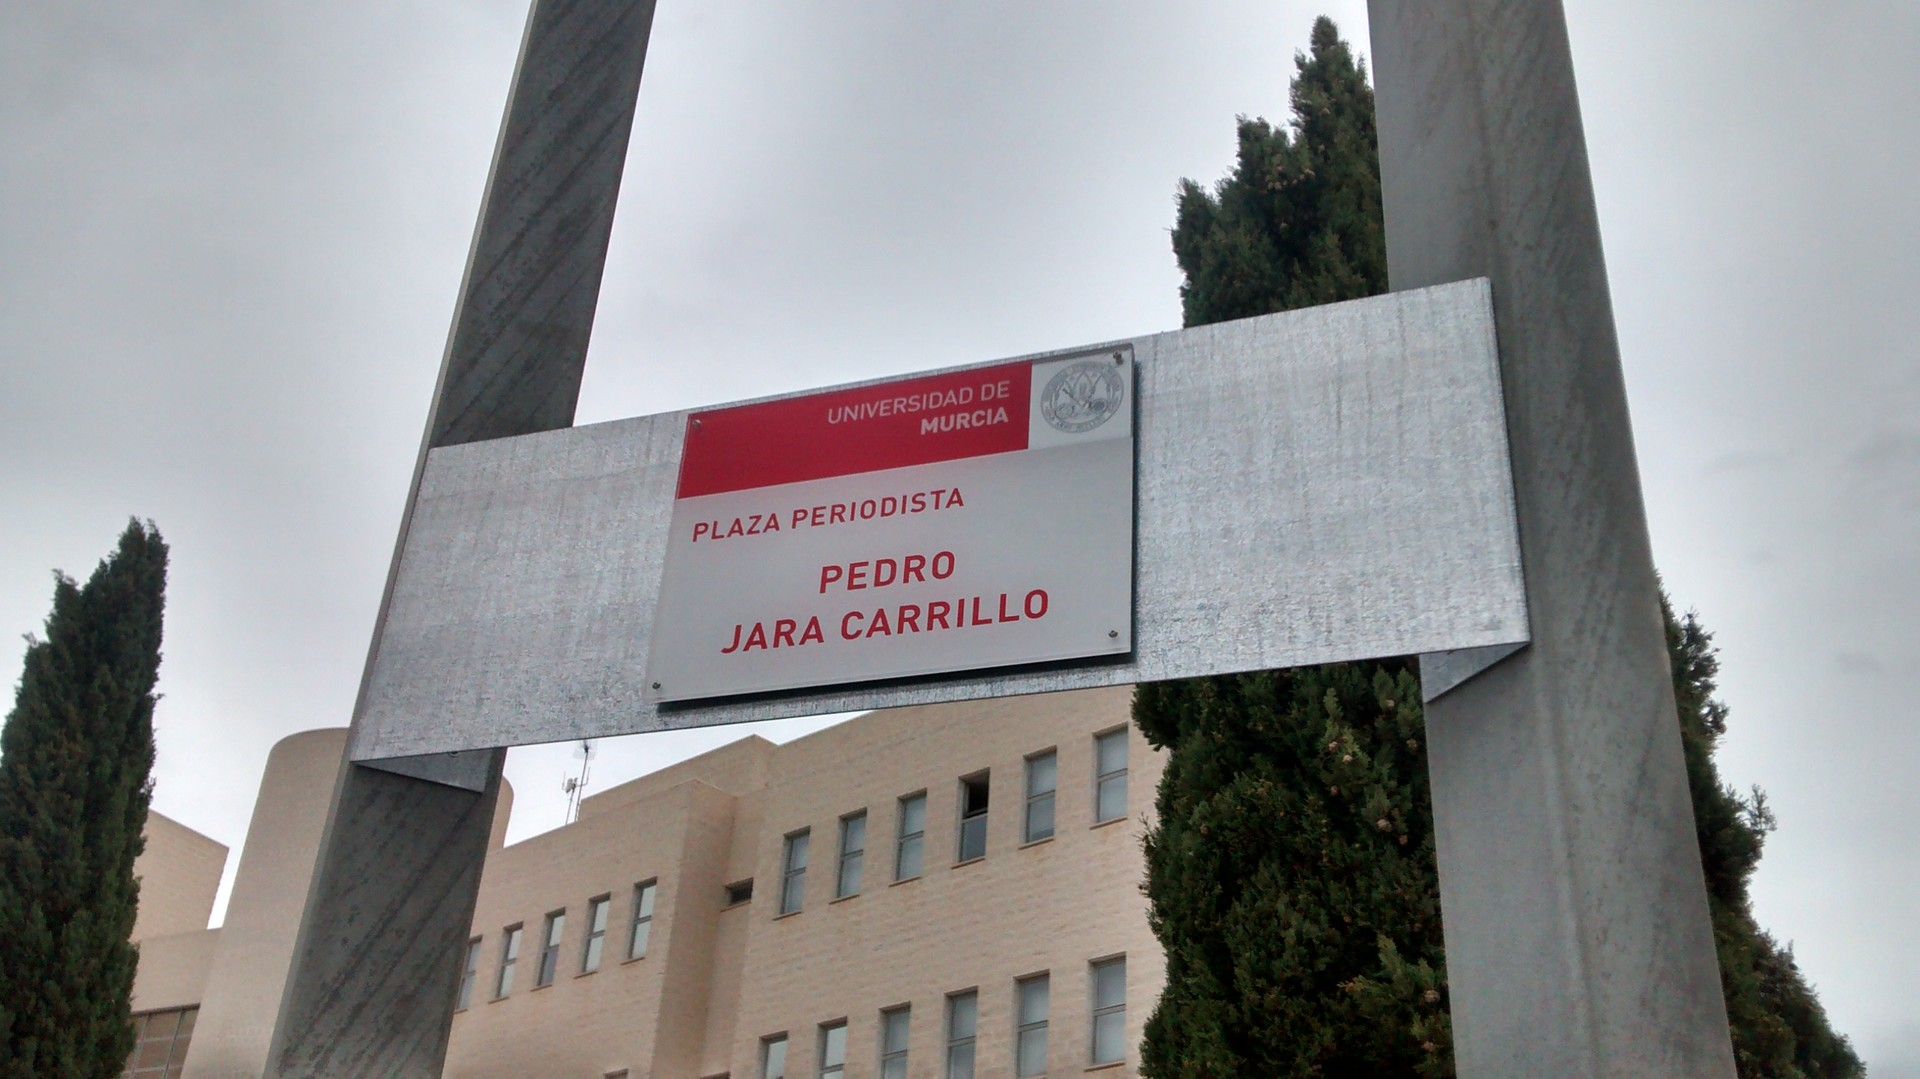 Campus De La Merced Experiencia Erasmus Um